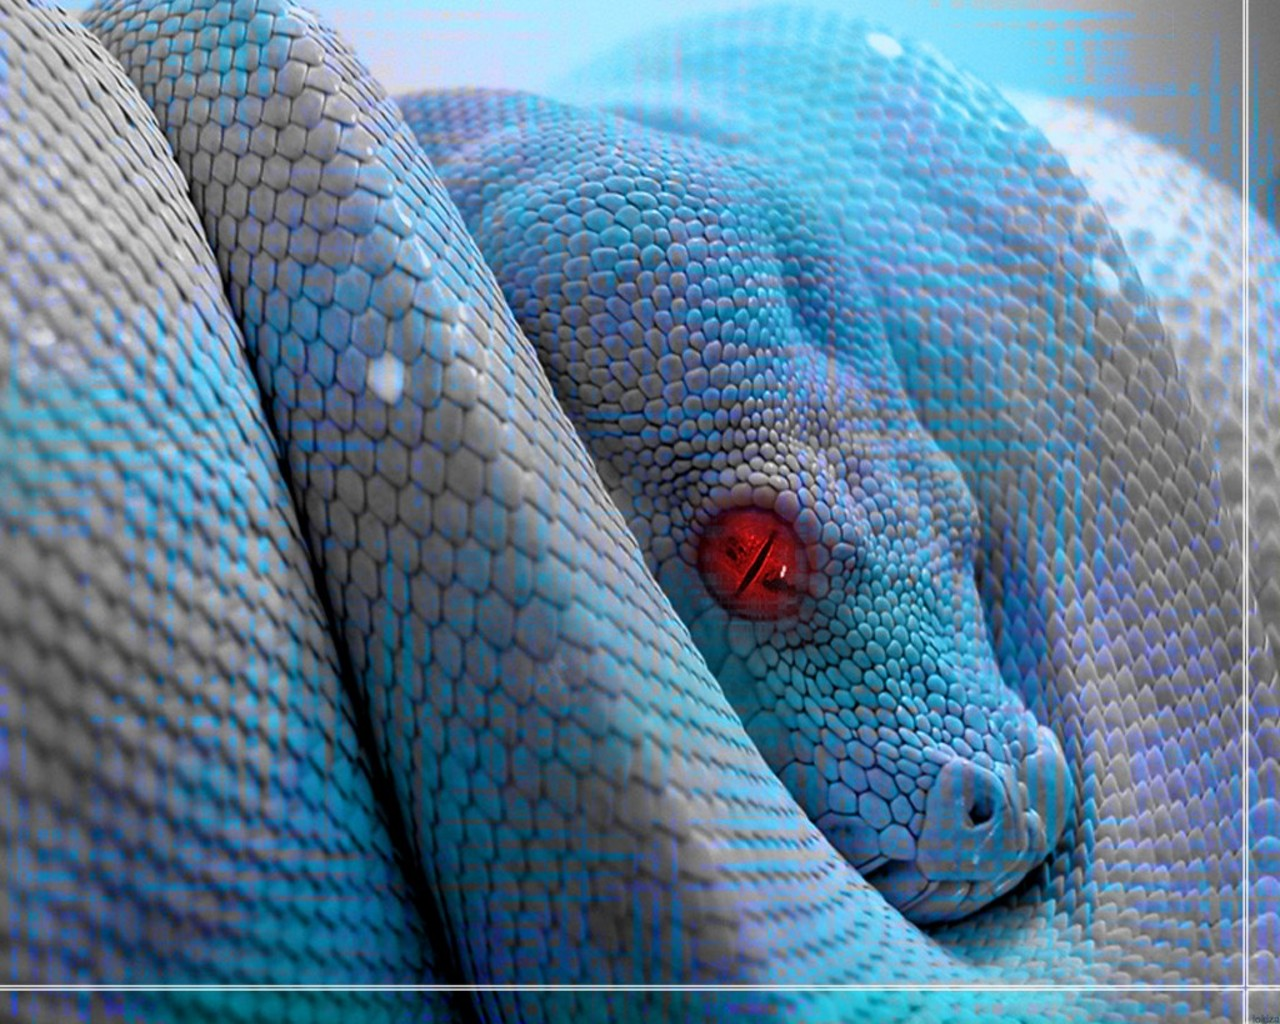 http://4.bp.blogspot.com/-axN_LvmXDks/TeOmkM_bxNI/AAAAAAAABk8/ozqso708eH4/s1600/animals_reptiles-snake-wallpaper_1.jpg